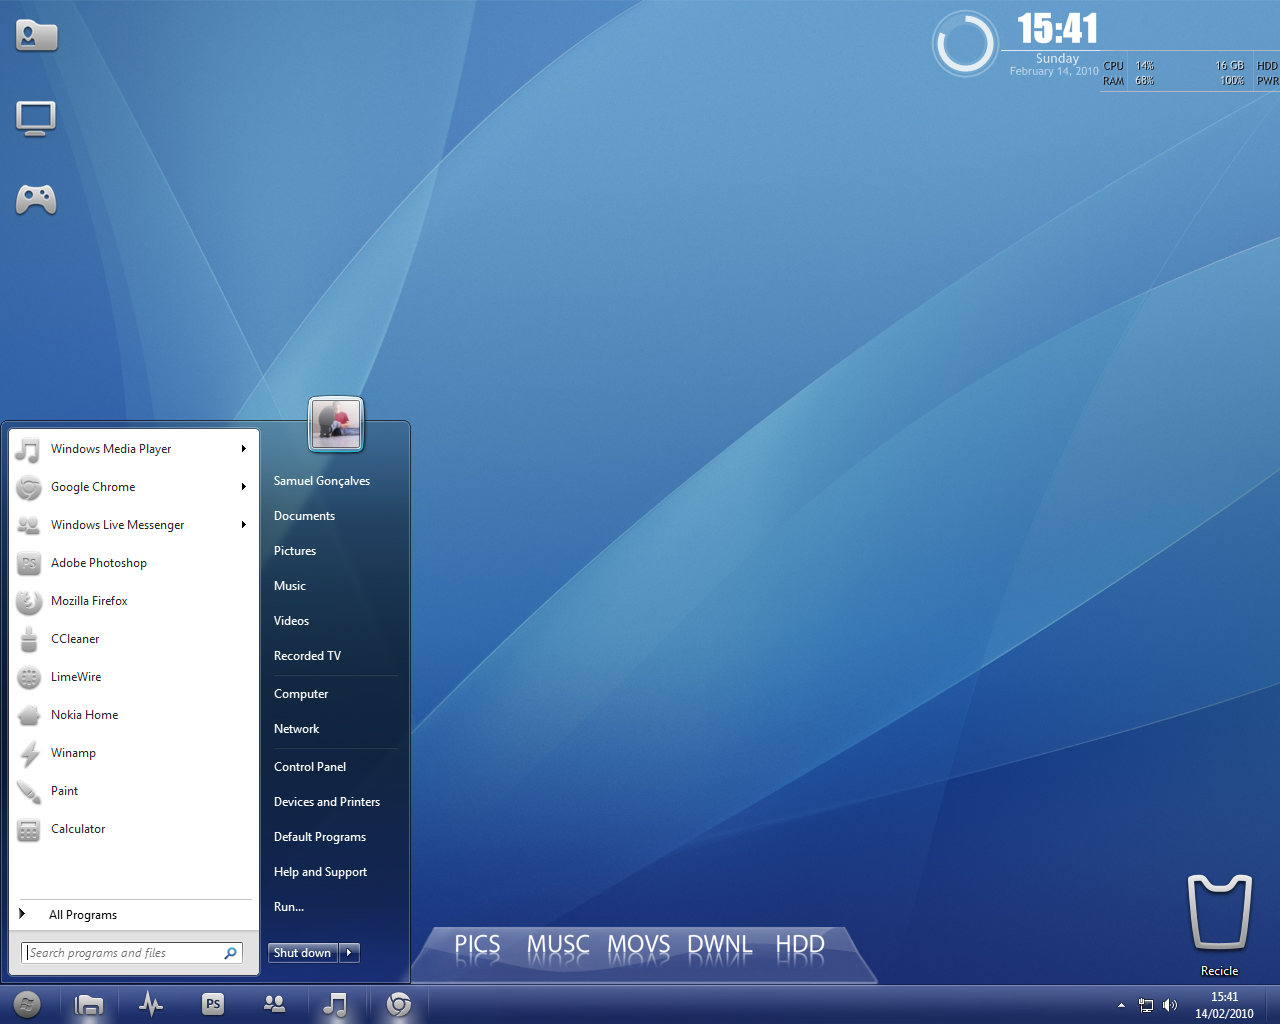 wordpresscom20100108mudar wallpaper windows 7 starter 1280x1024